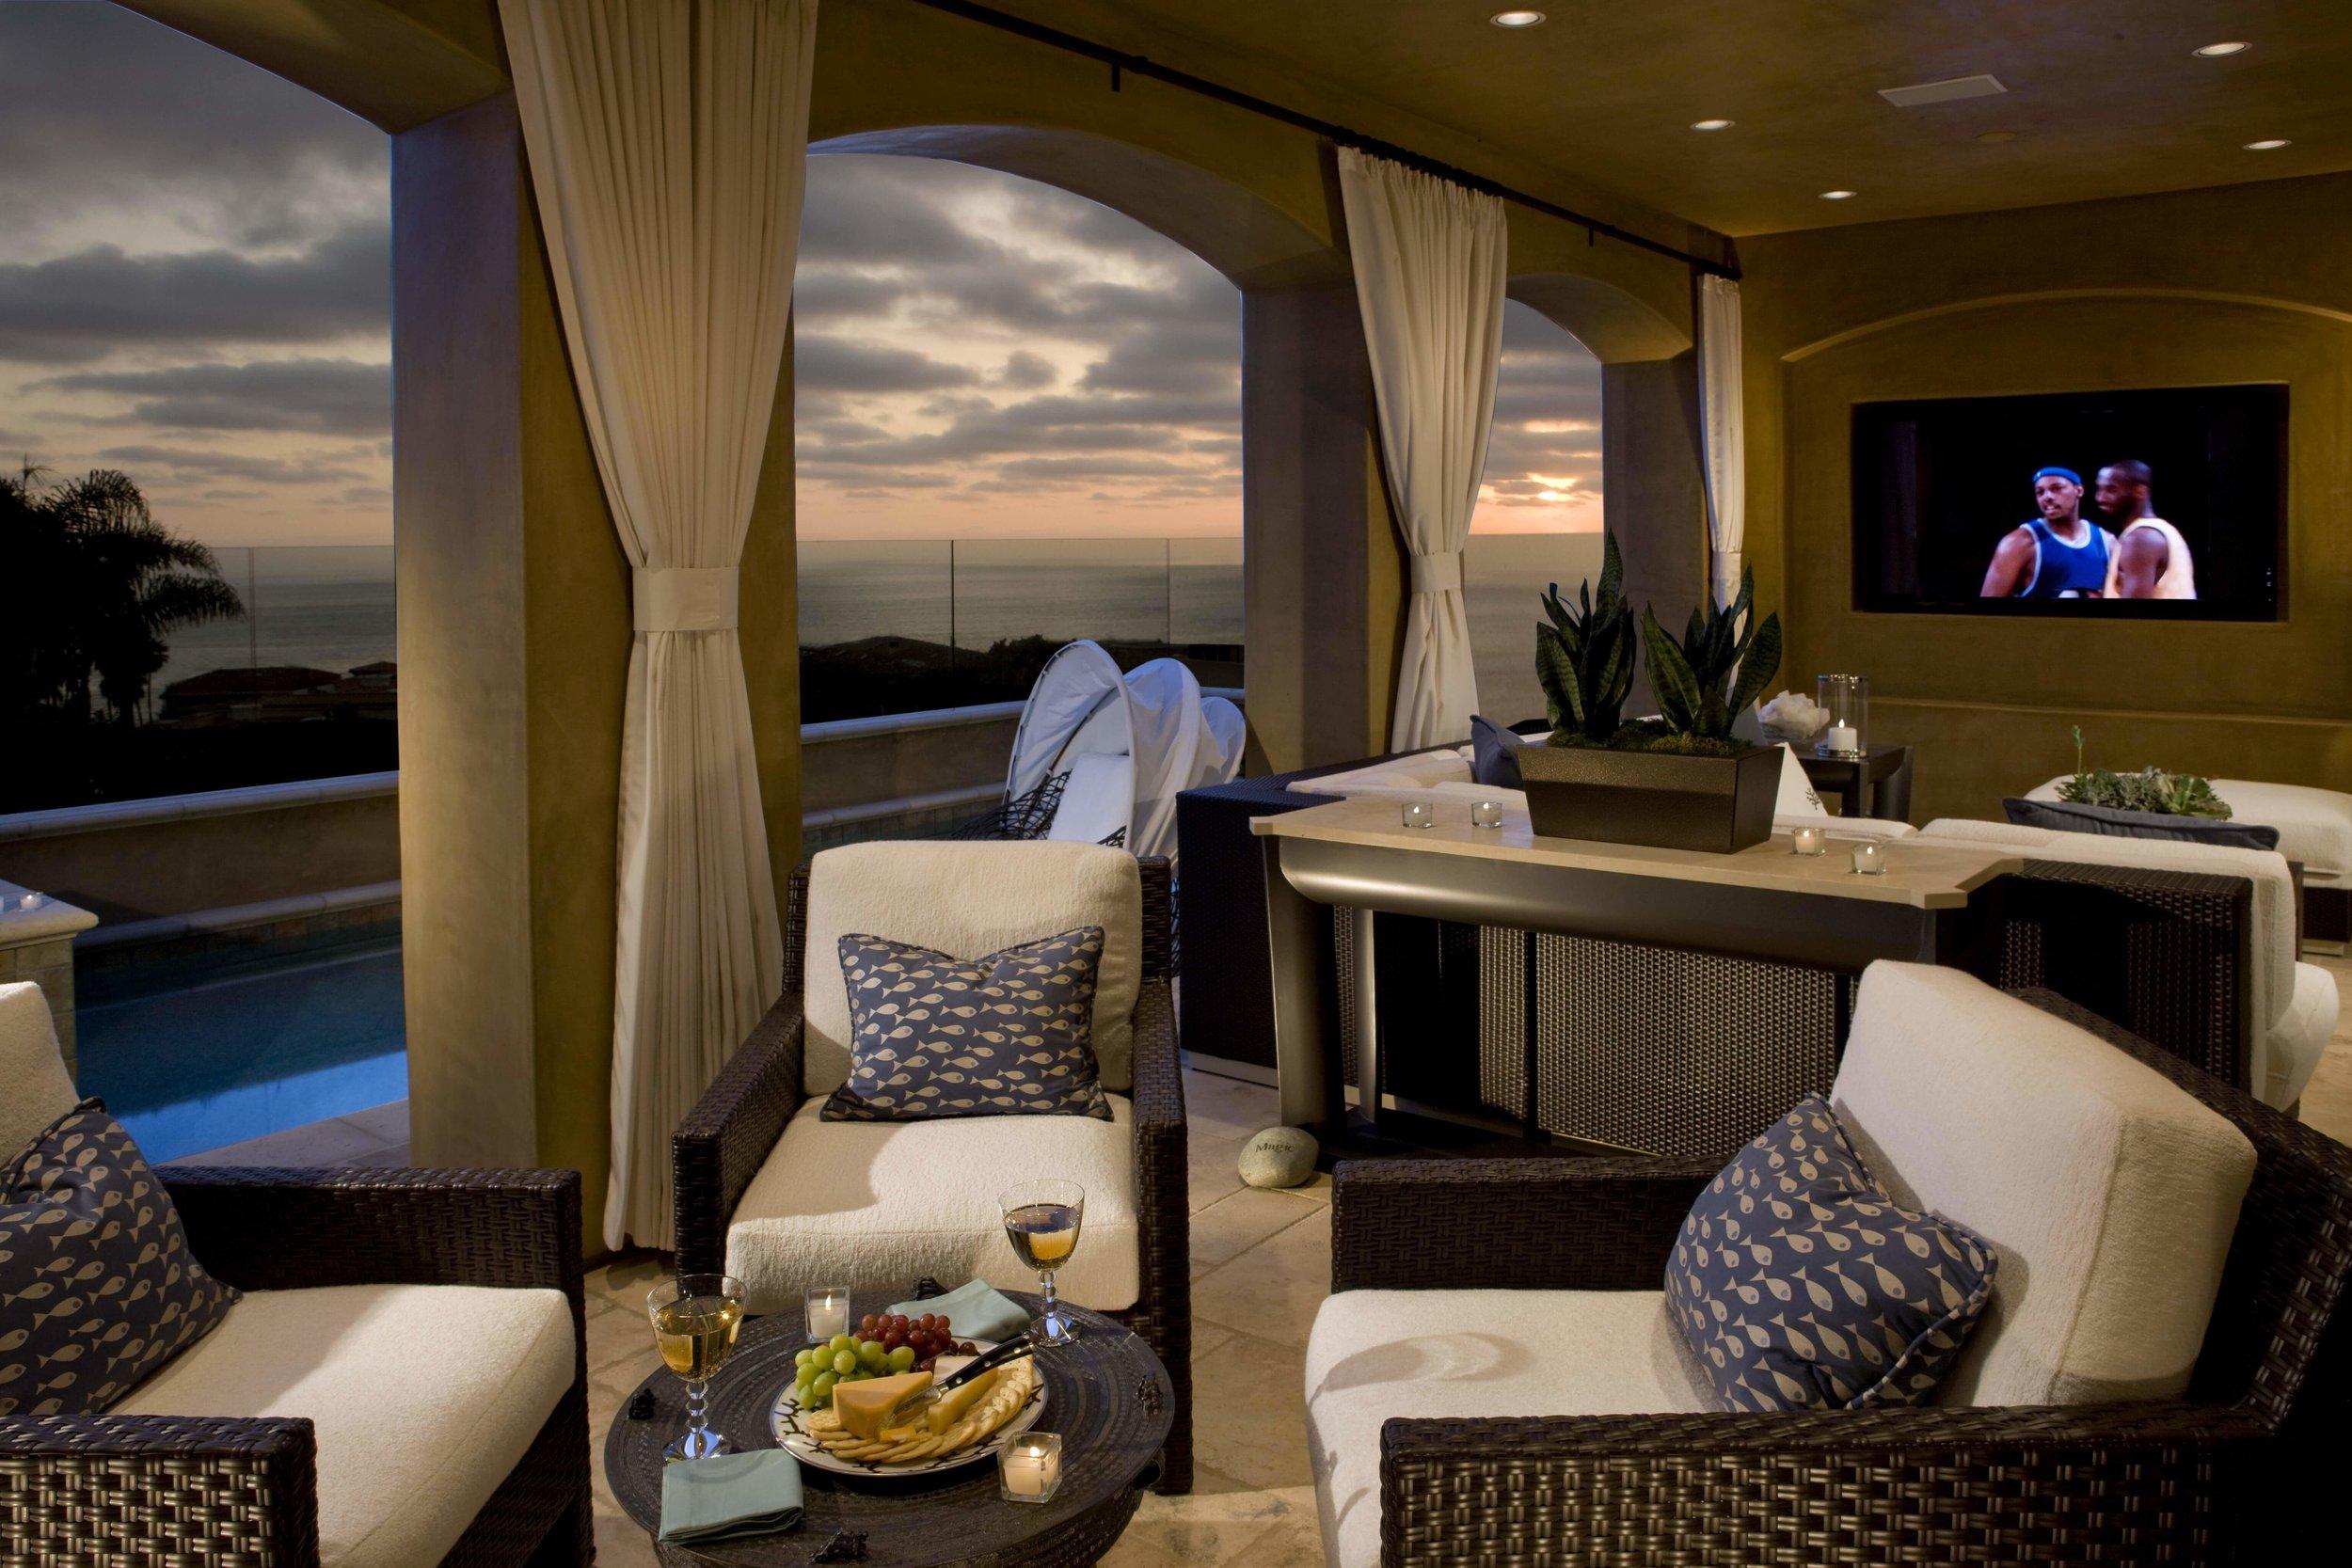 elizabeth-tapper-interiors-ritz-cove-laguna-oceanview-sitting-room-great-room-lounge-room.jpg